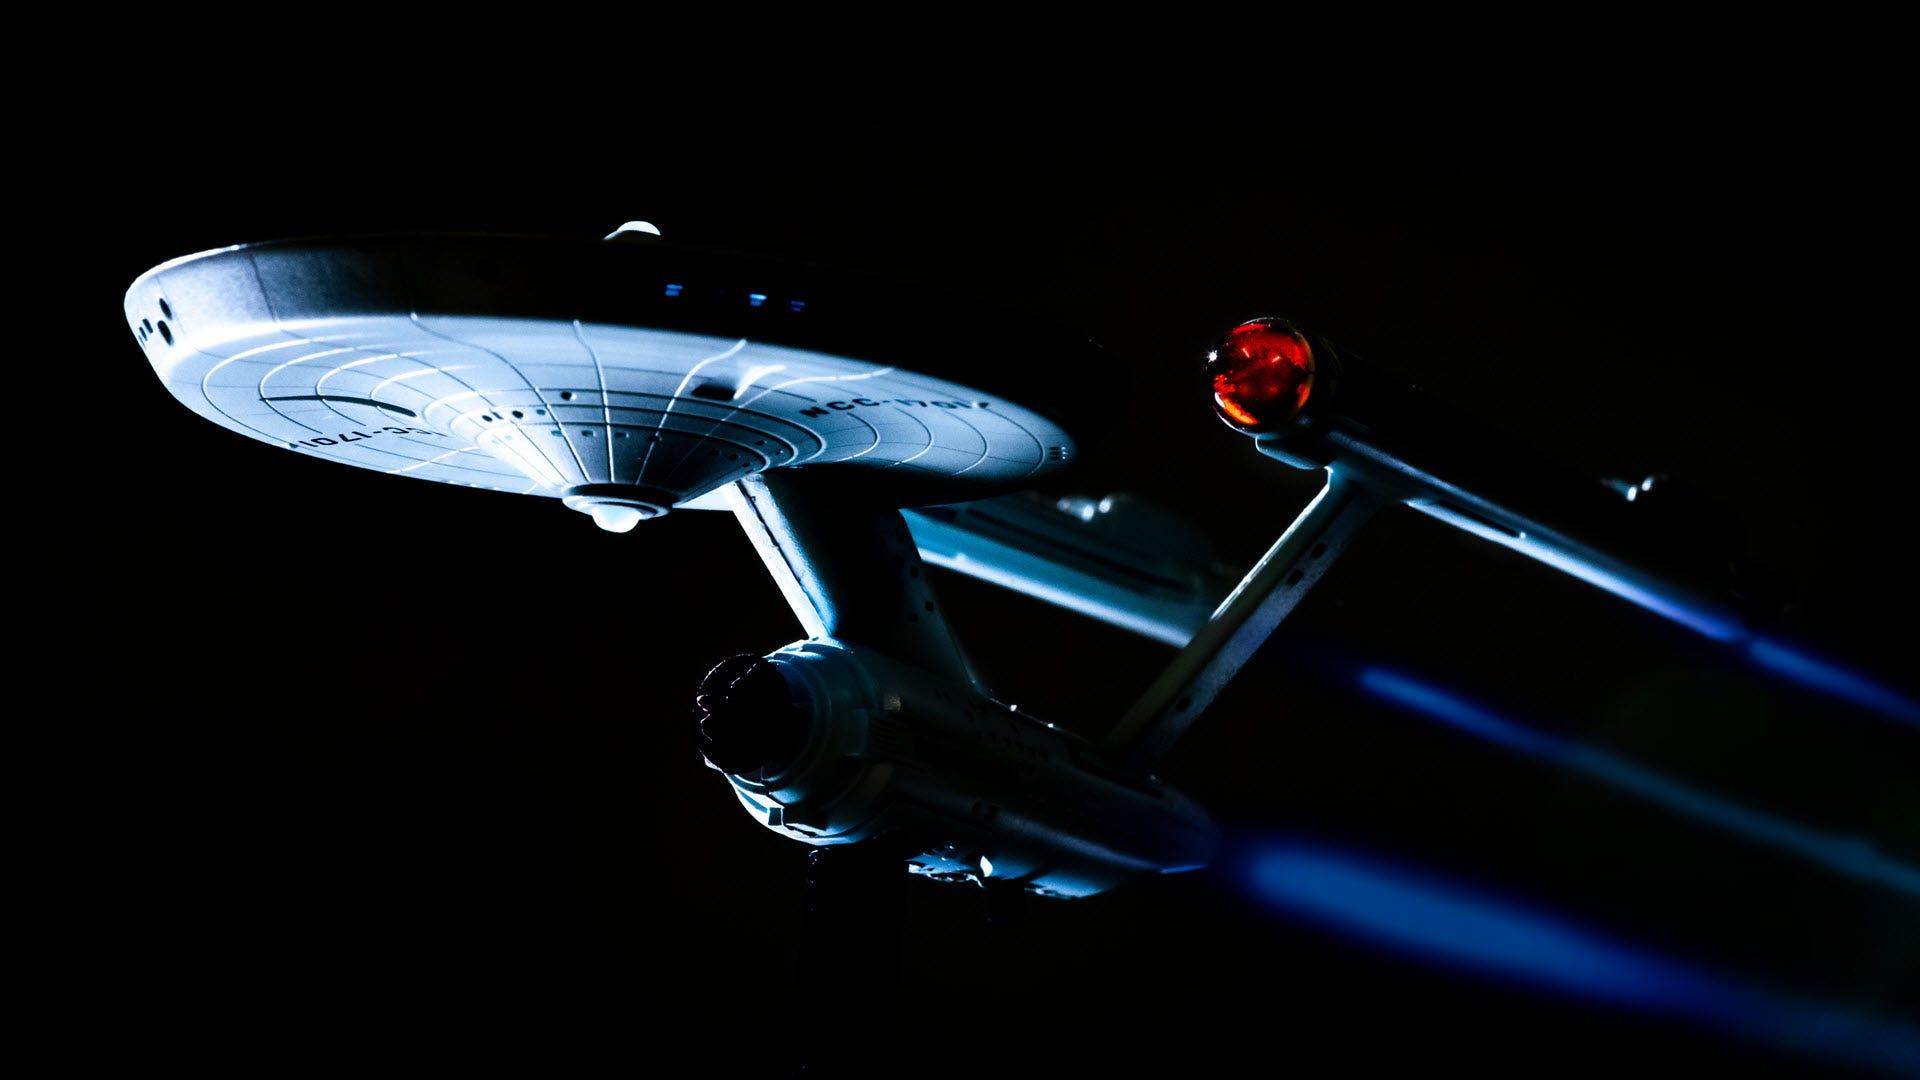 The Enterprise from 'Star Trek' warping through space.